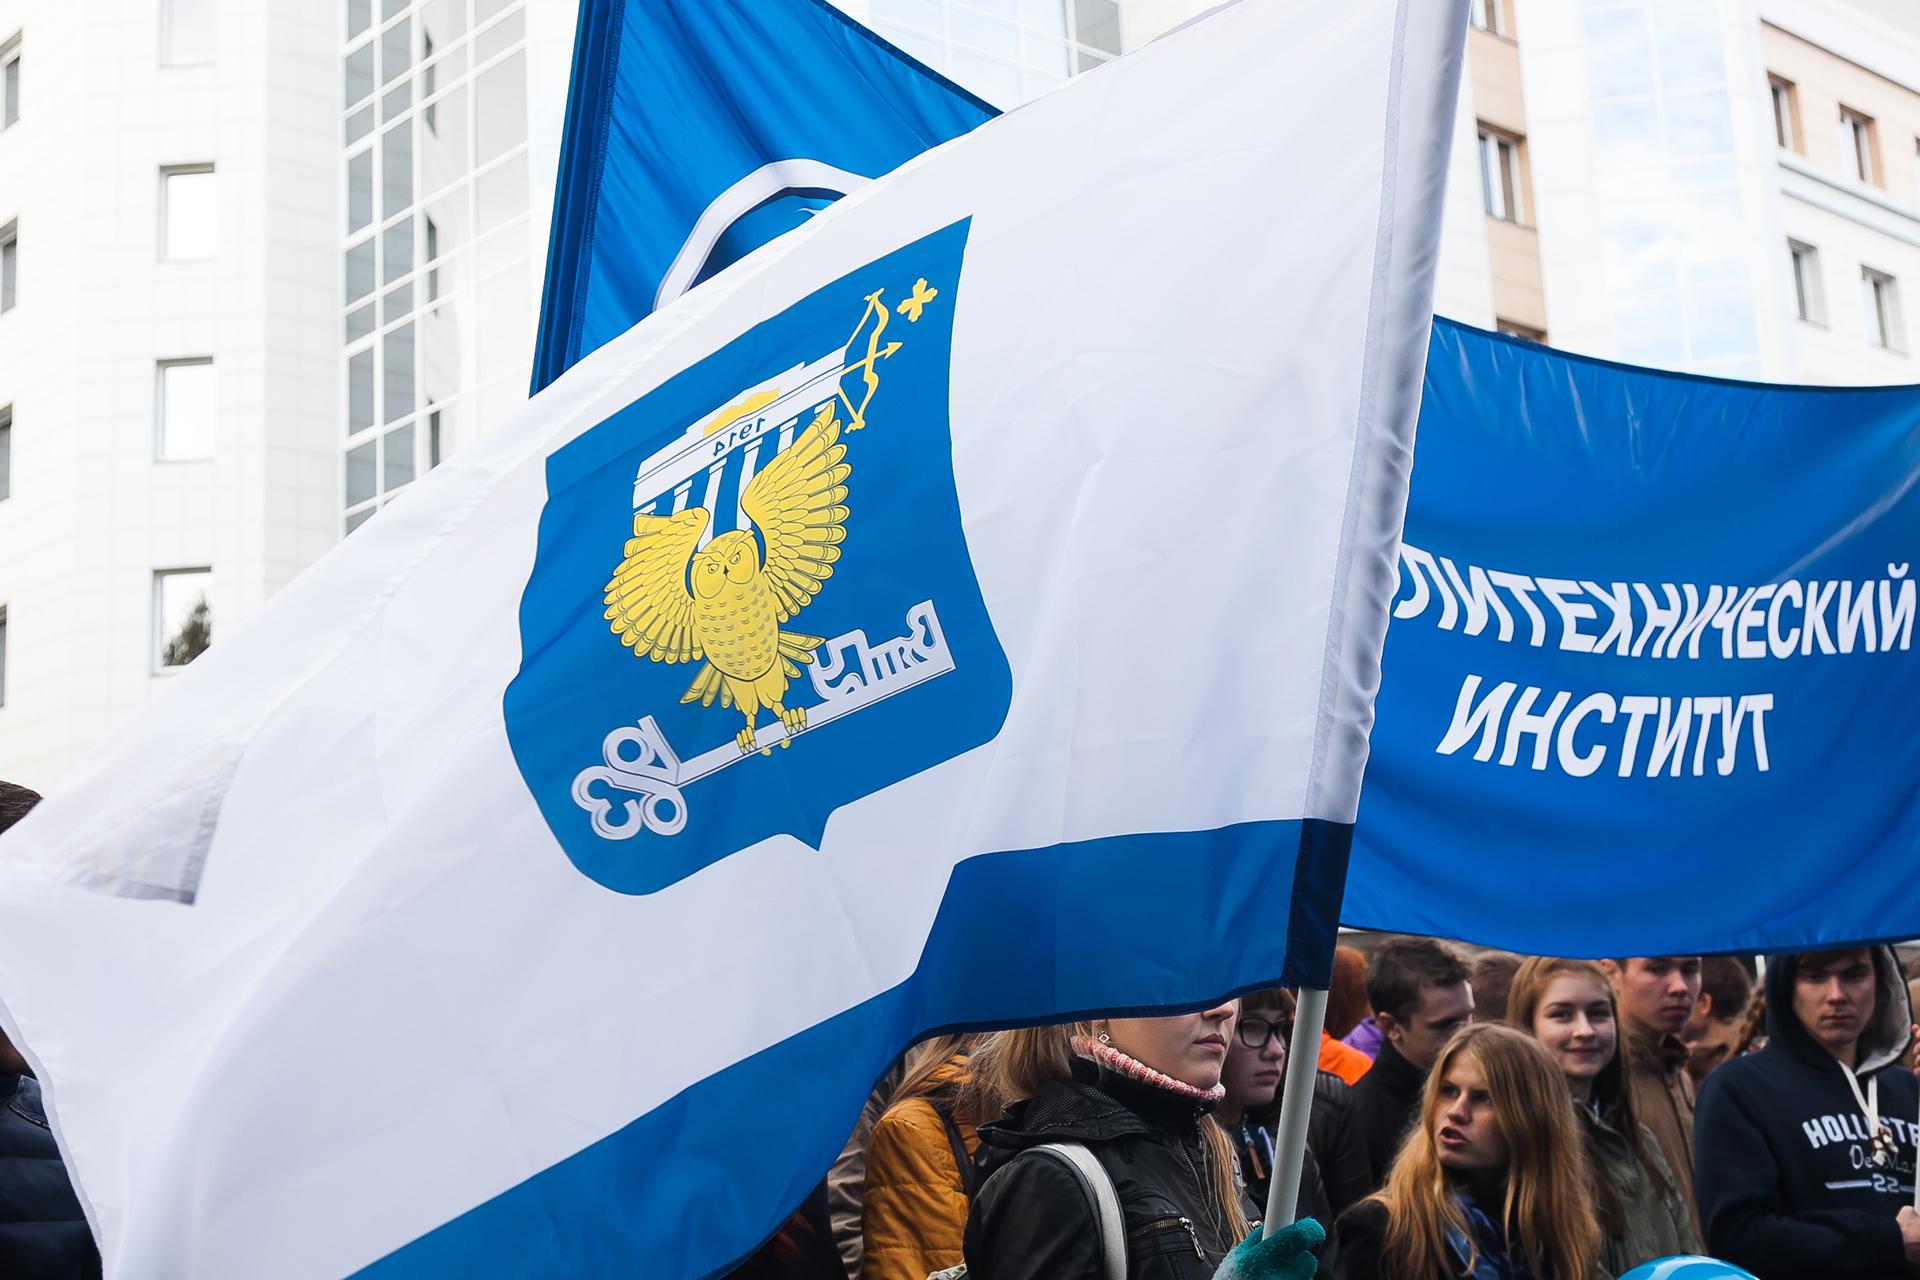 Парад студенчества 2016